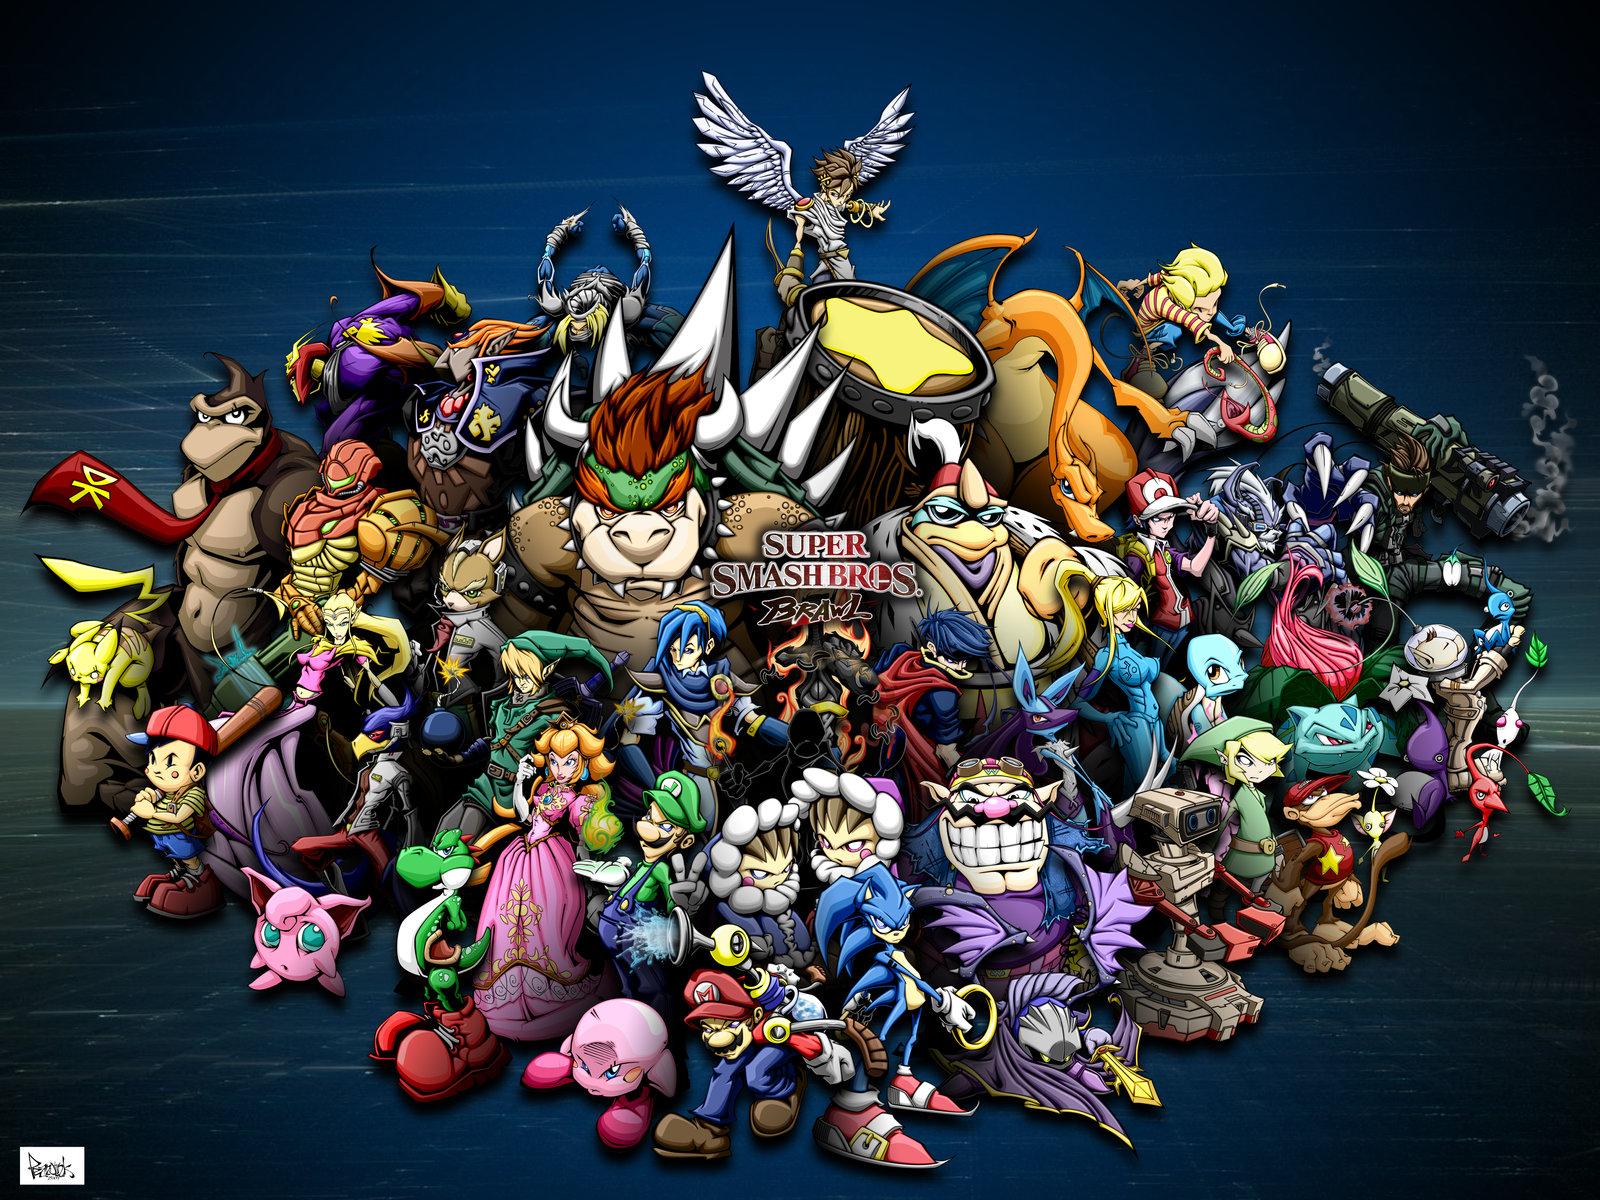 50 Super Smash Bros Melee Wallpaper On Wallpapersafari